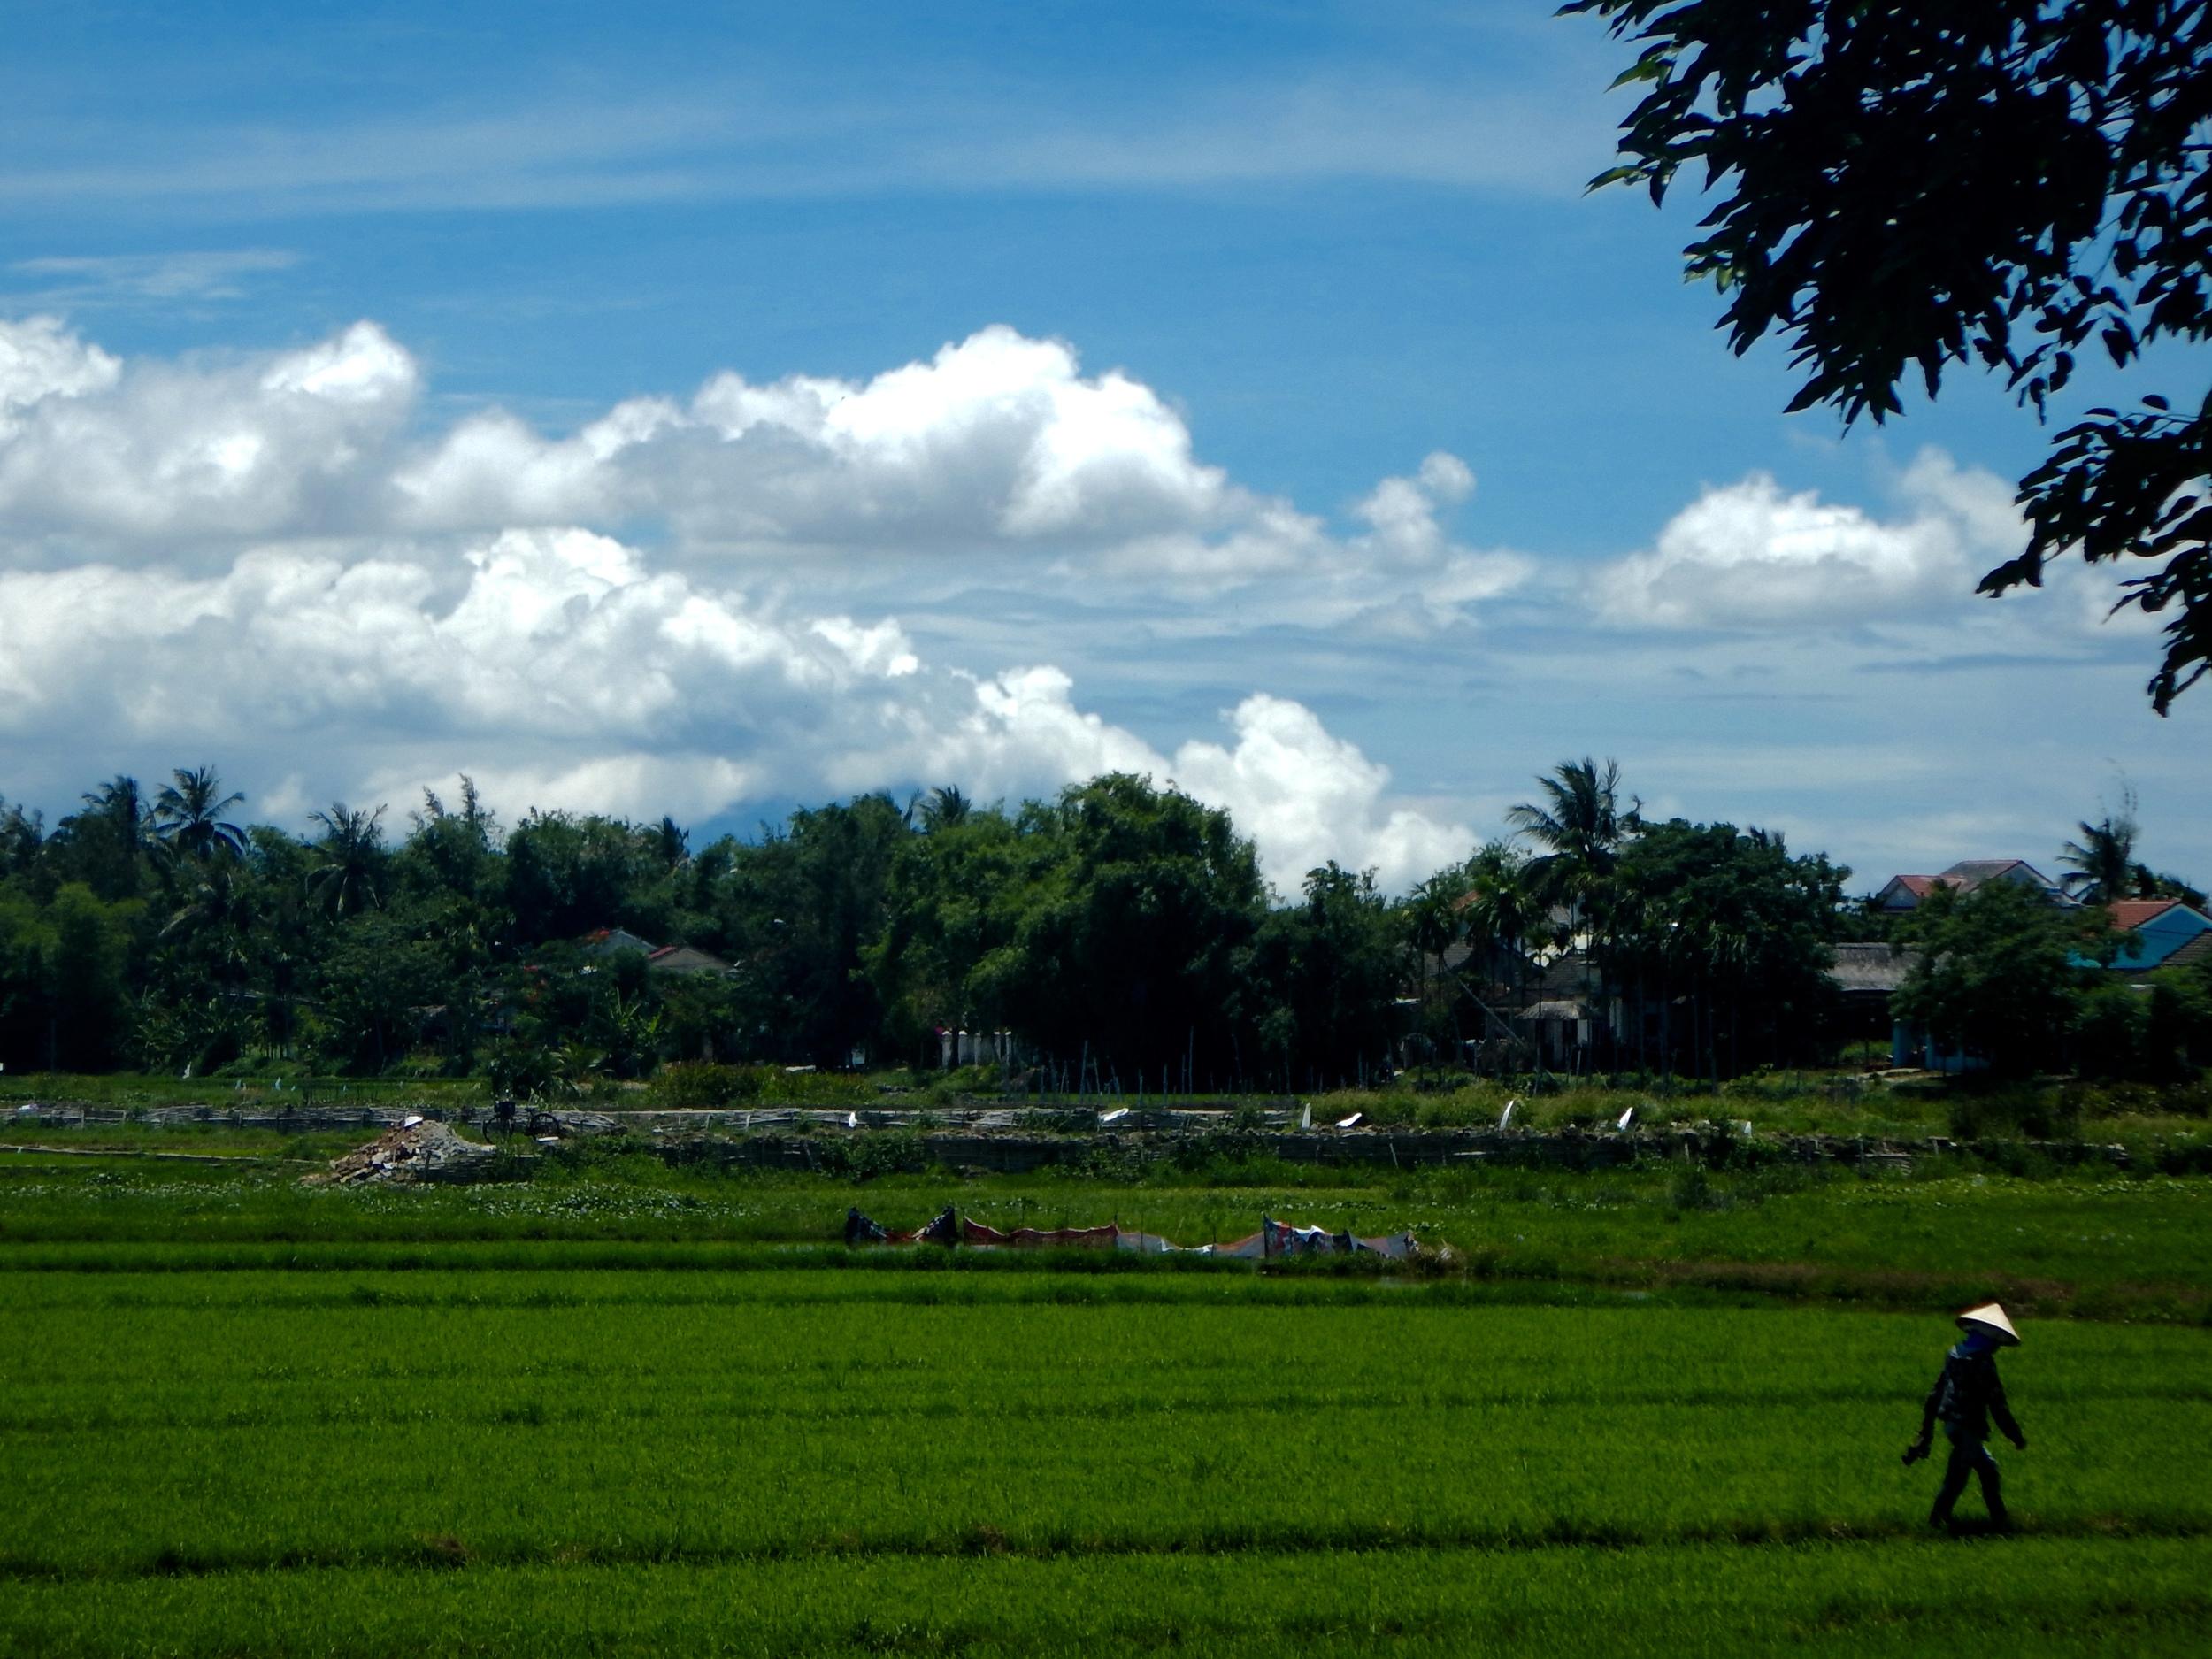 Rice field, Hoi An, 2016.